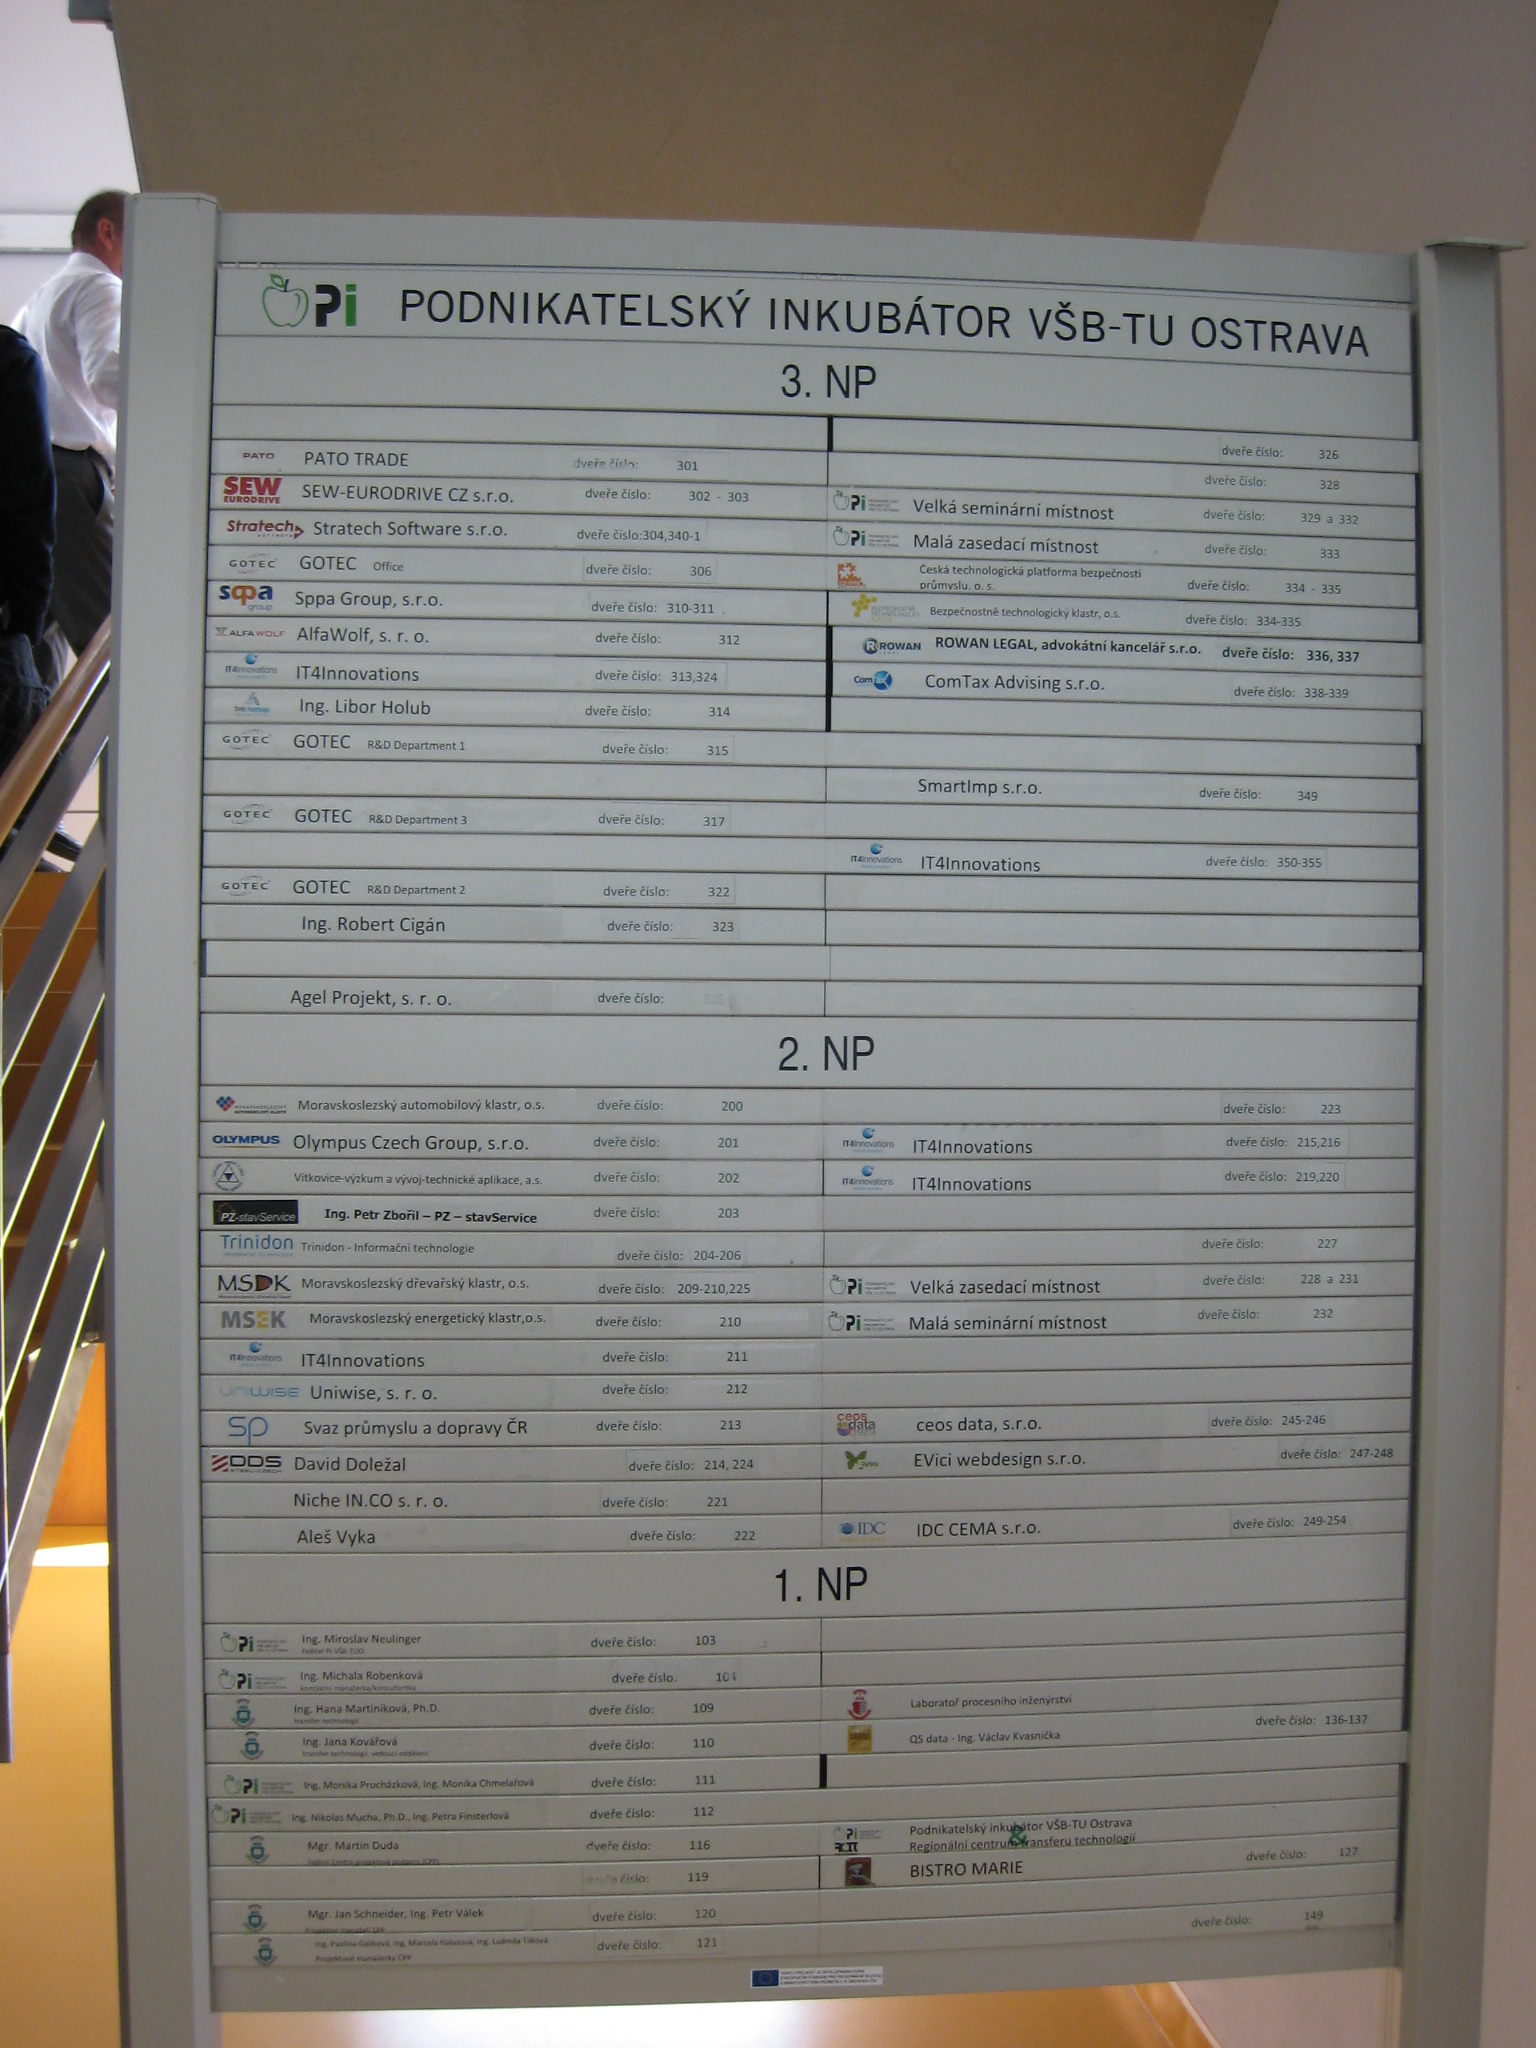 spinnet-ostrava-2012-026